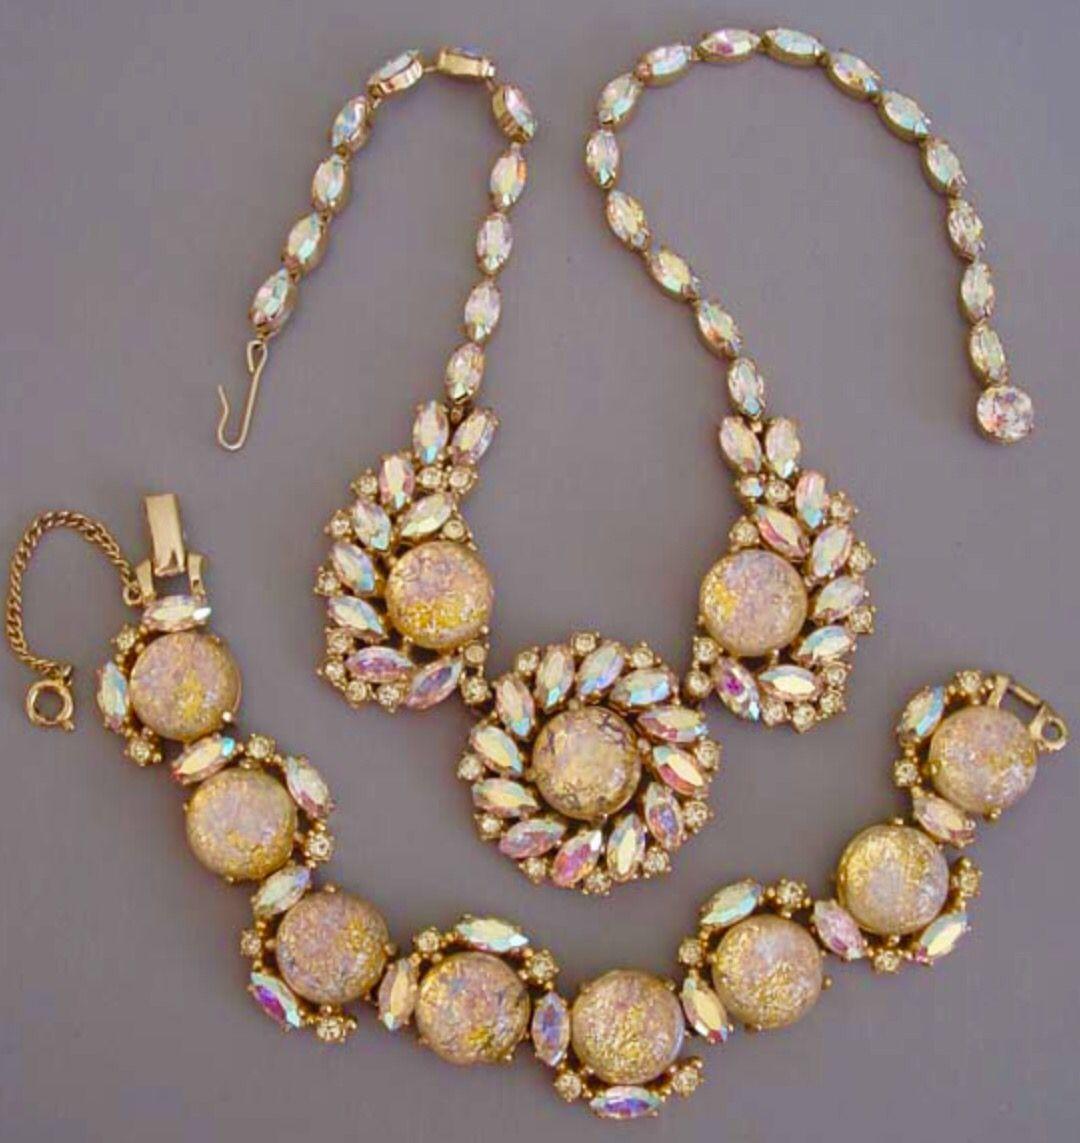 Schiaparelli Necklace and Bracelet in 2019 Vintage